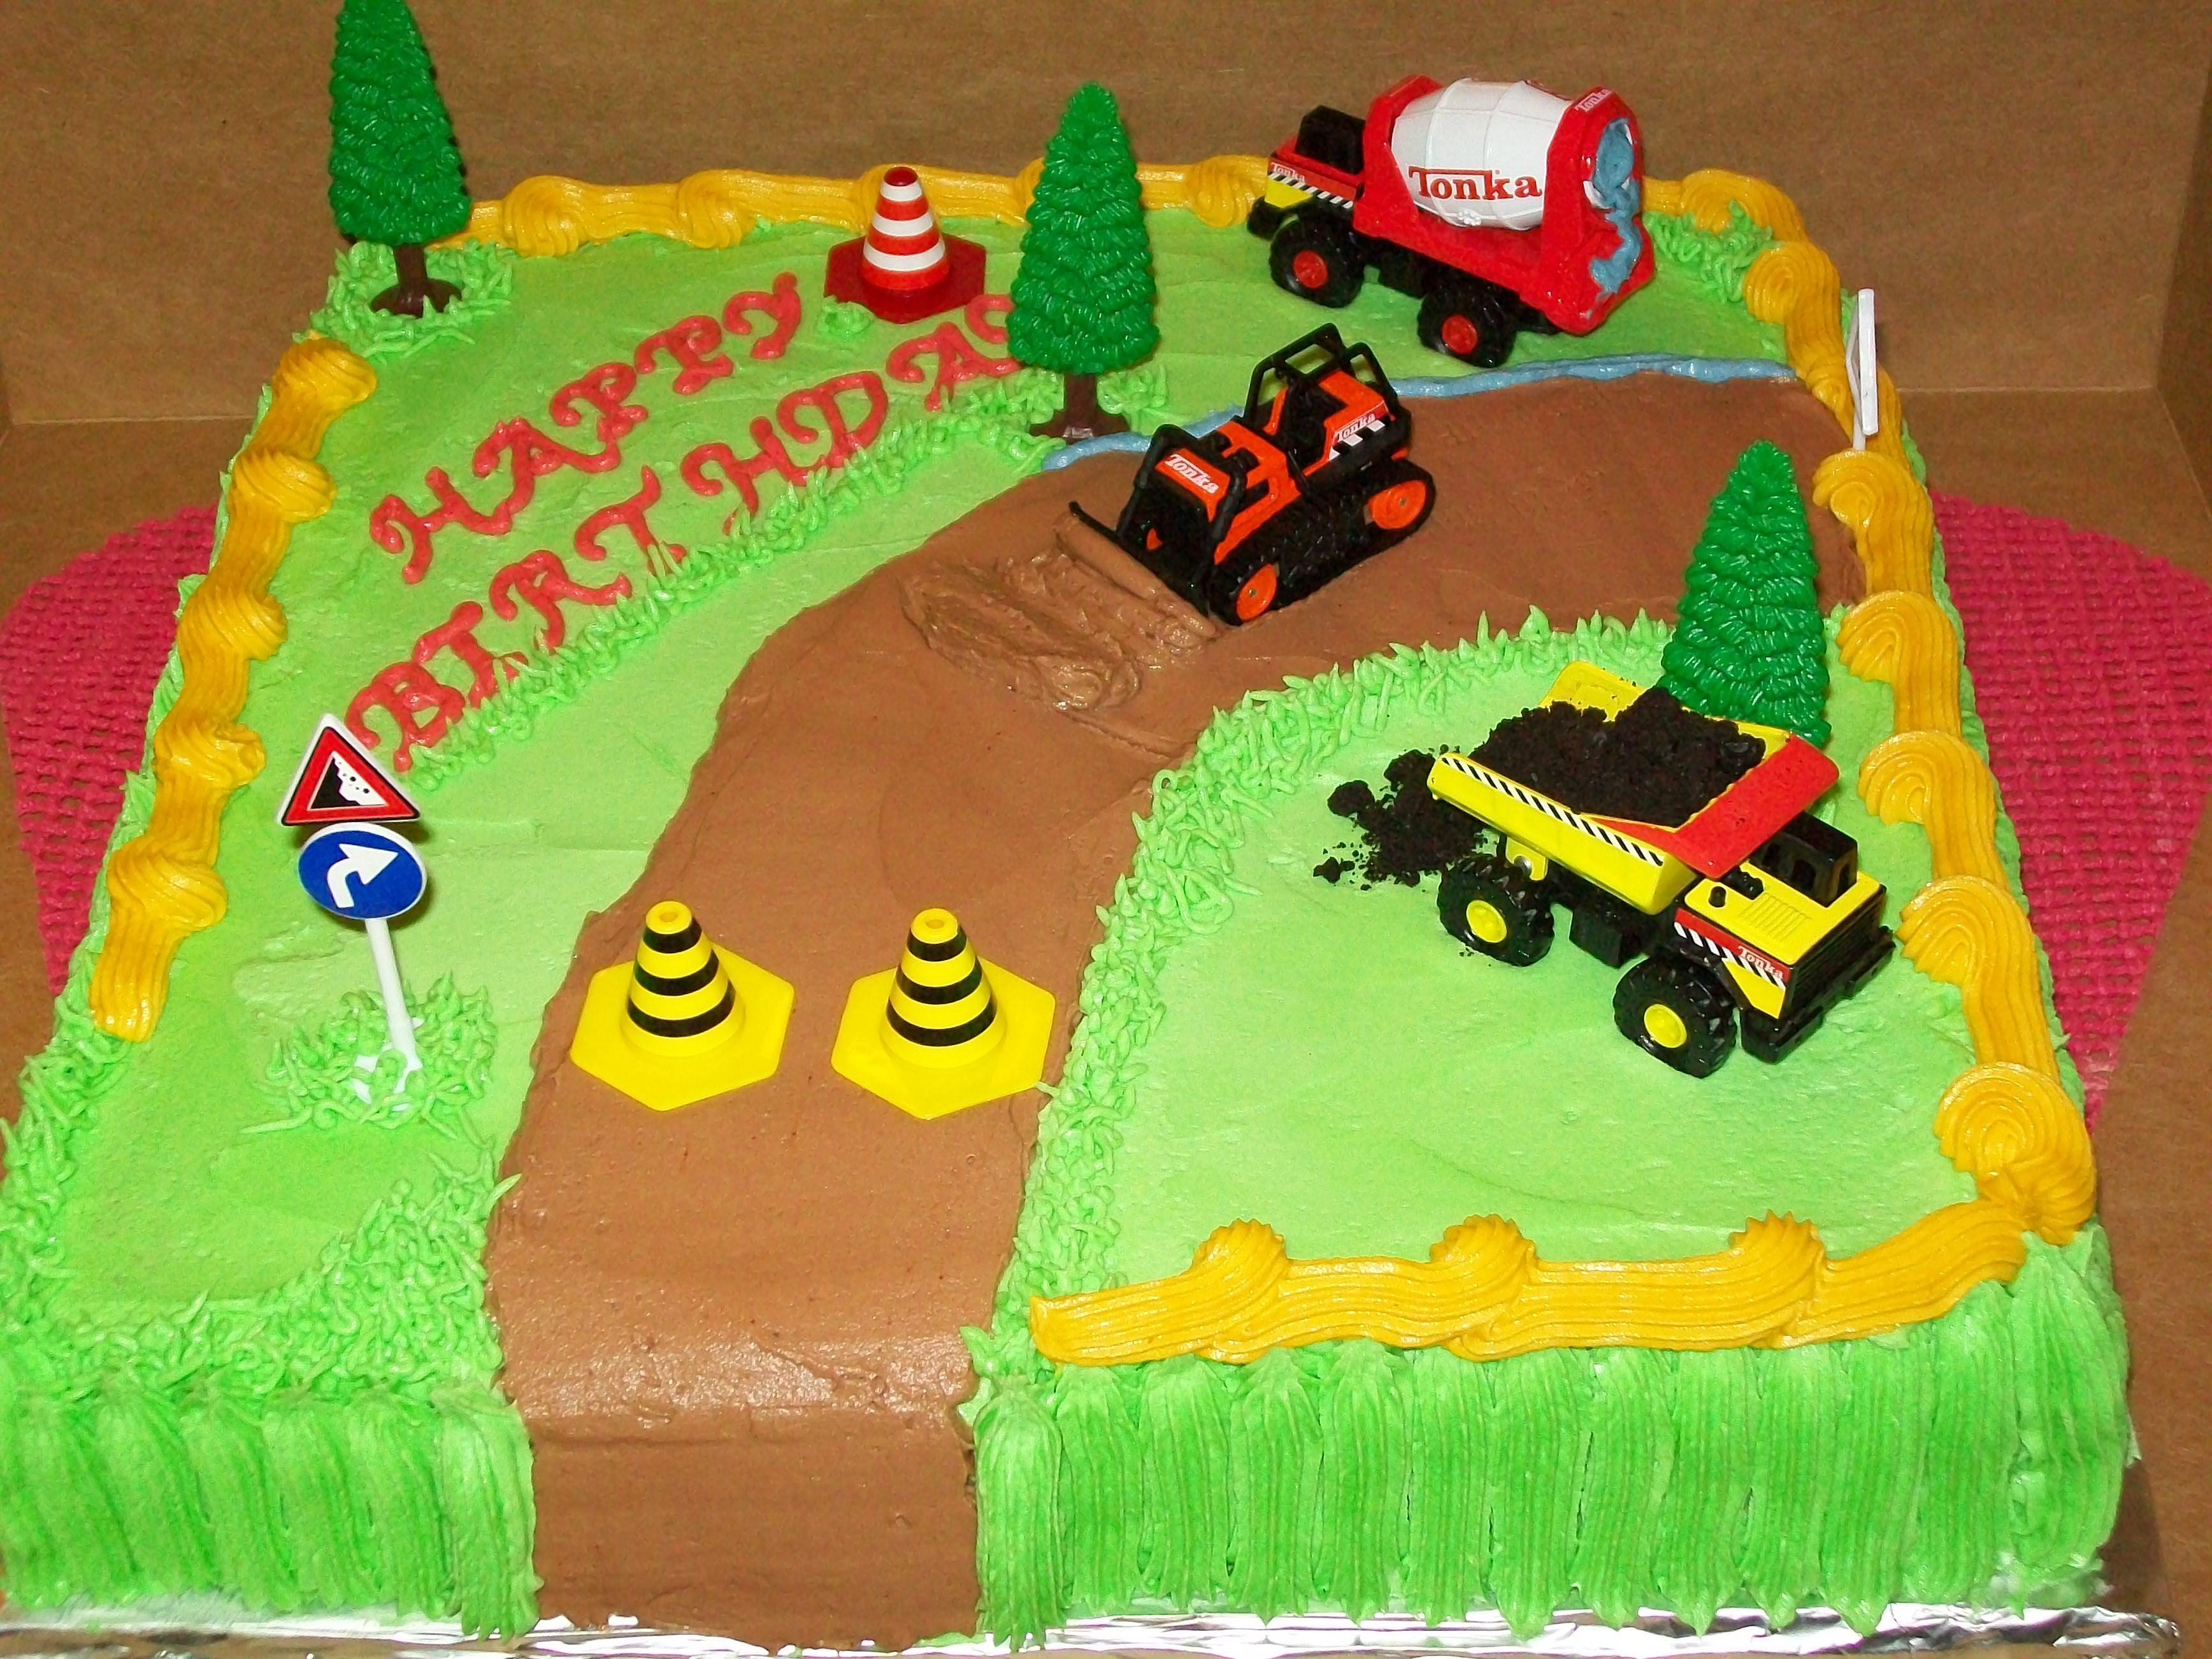 Cake Designs Wegmans : Frozen Birthday Cake Wegmans ~ Image Inspiration of Cake ...